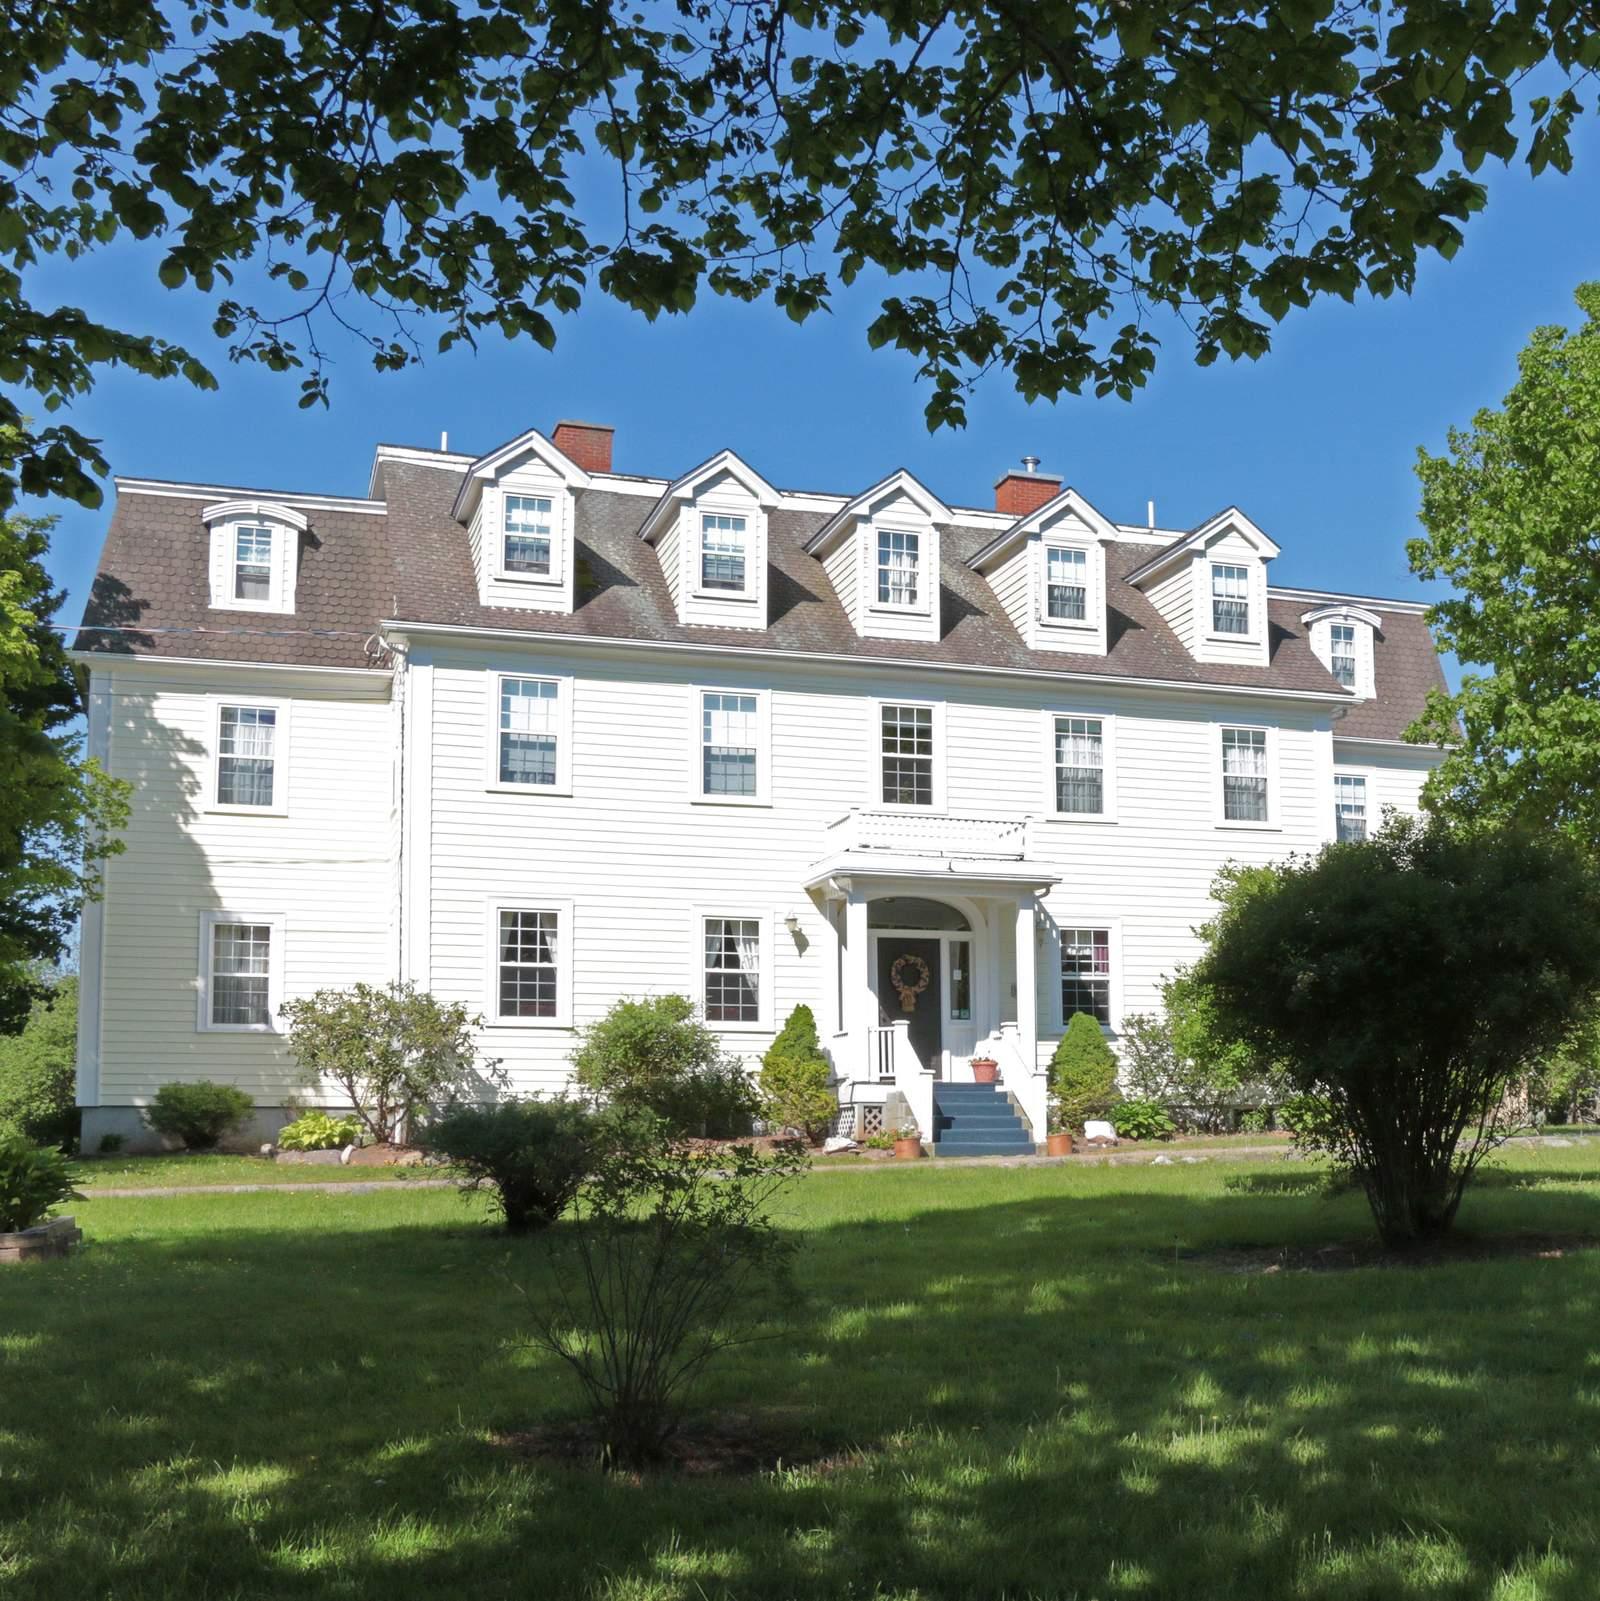 DesBarres Manor Inn